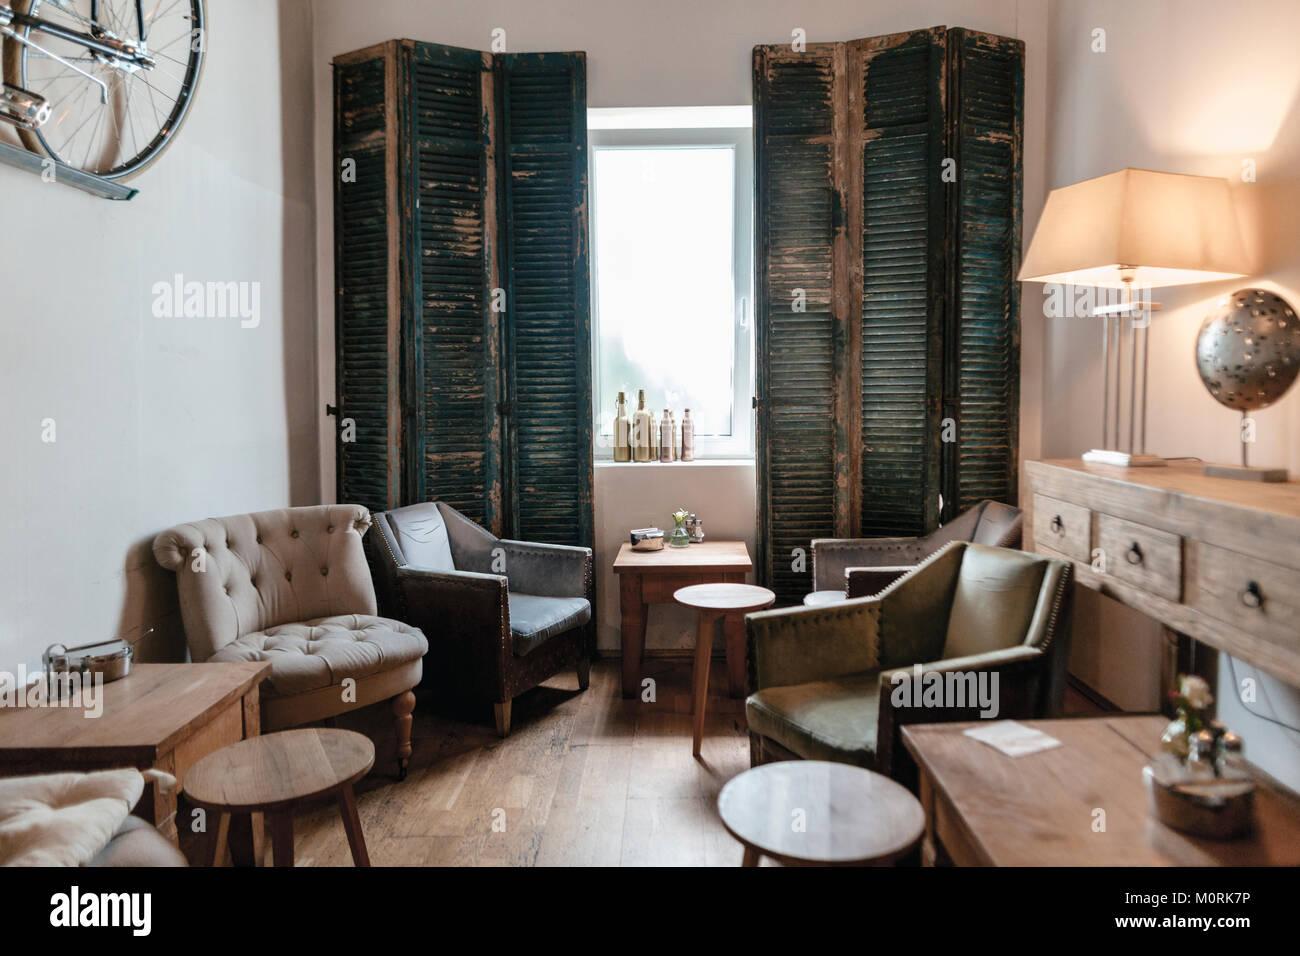 Interieur aus einem Cafe Stockbild